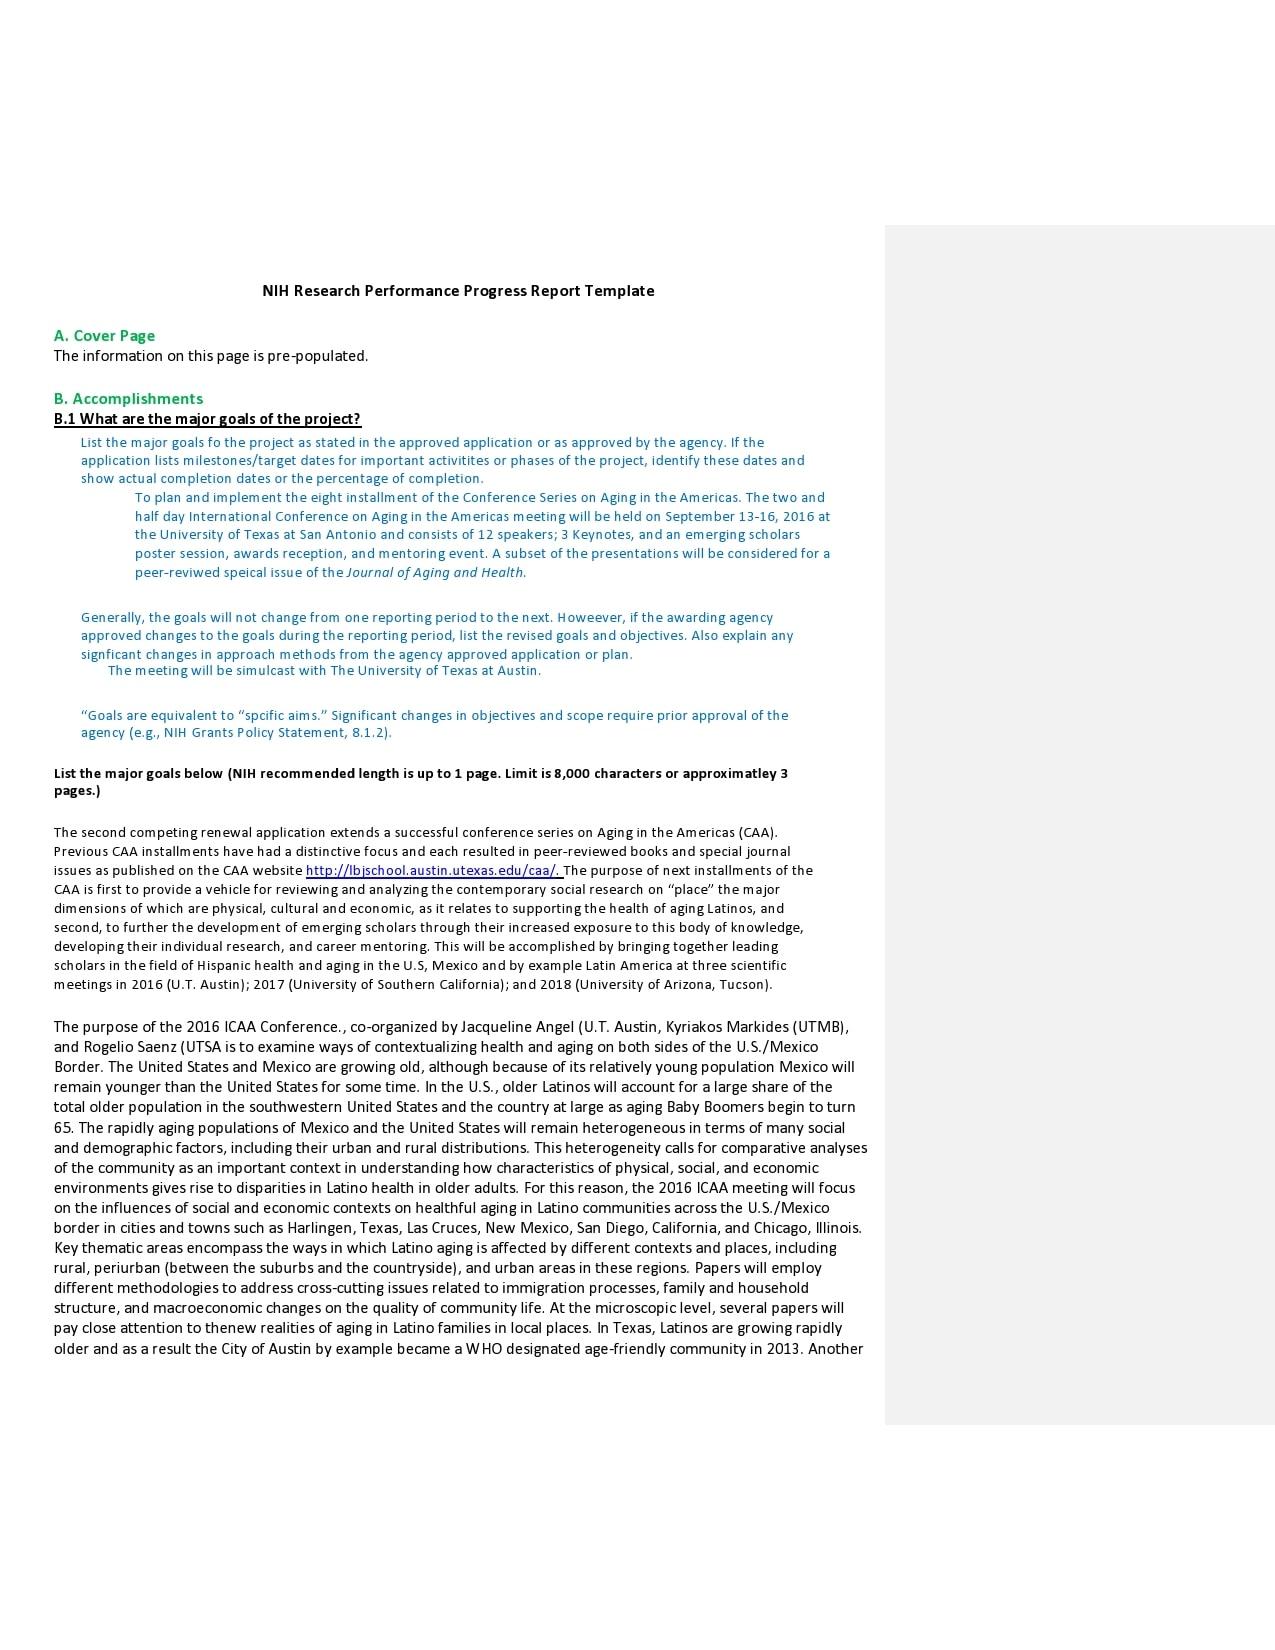 progress report template 11